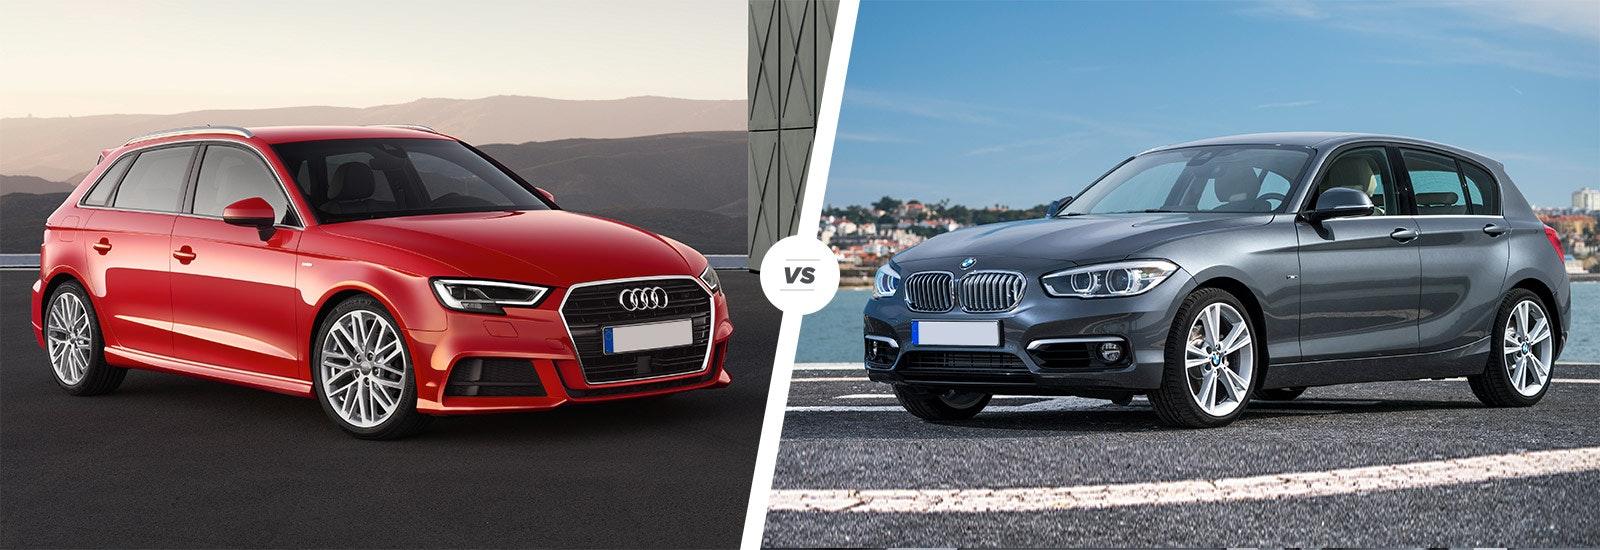 A3 Vs Serie 1 >> Audi A3 vs BMW 1 Series hatchback comparison   carwow